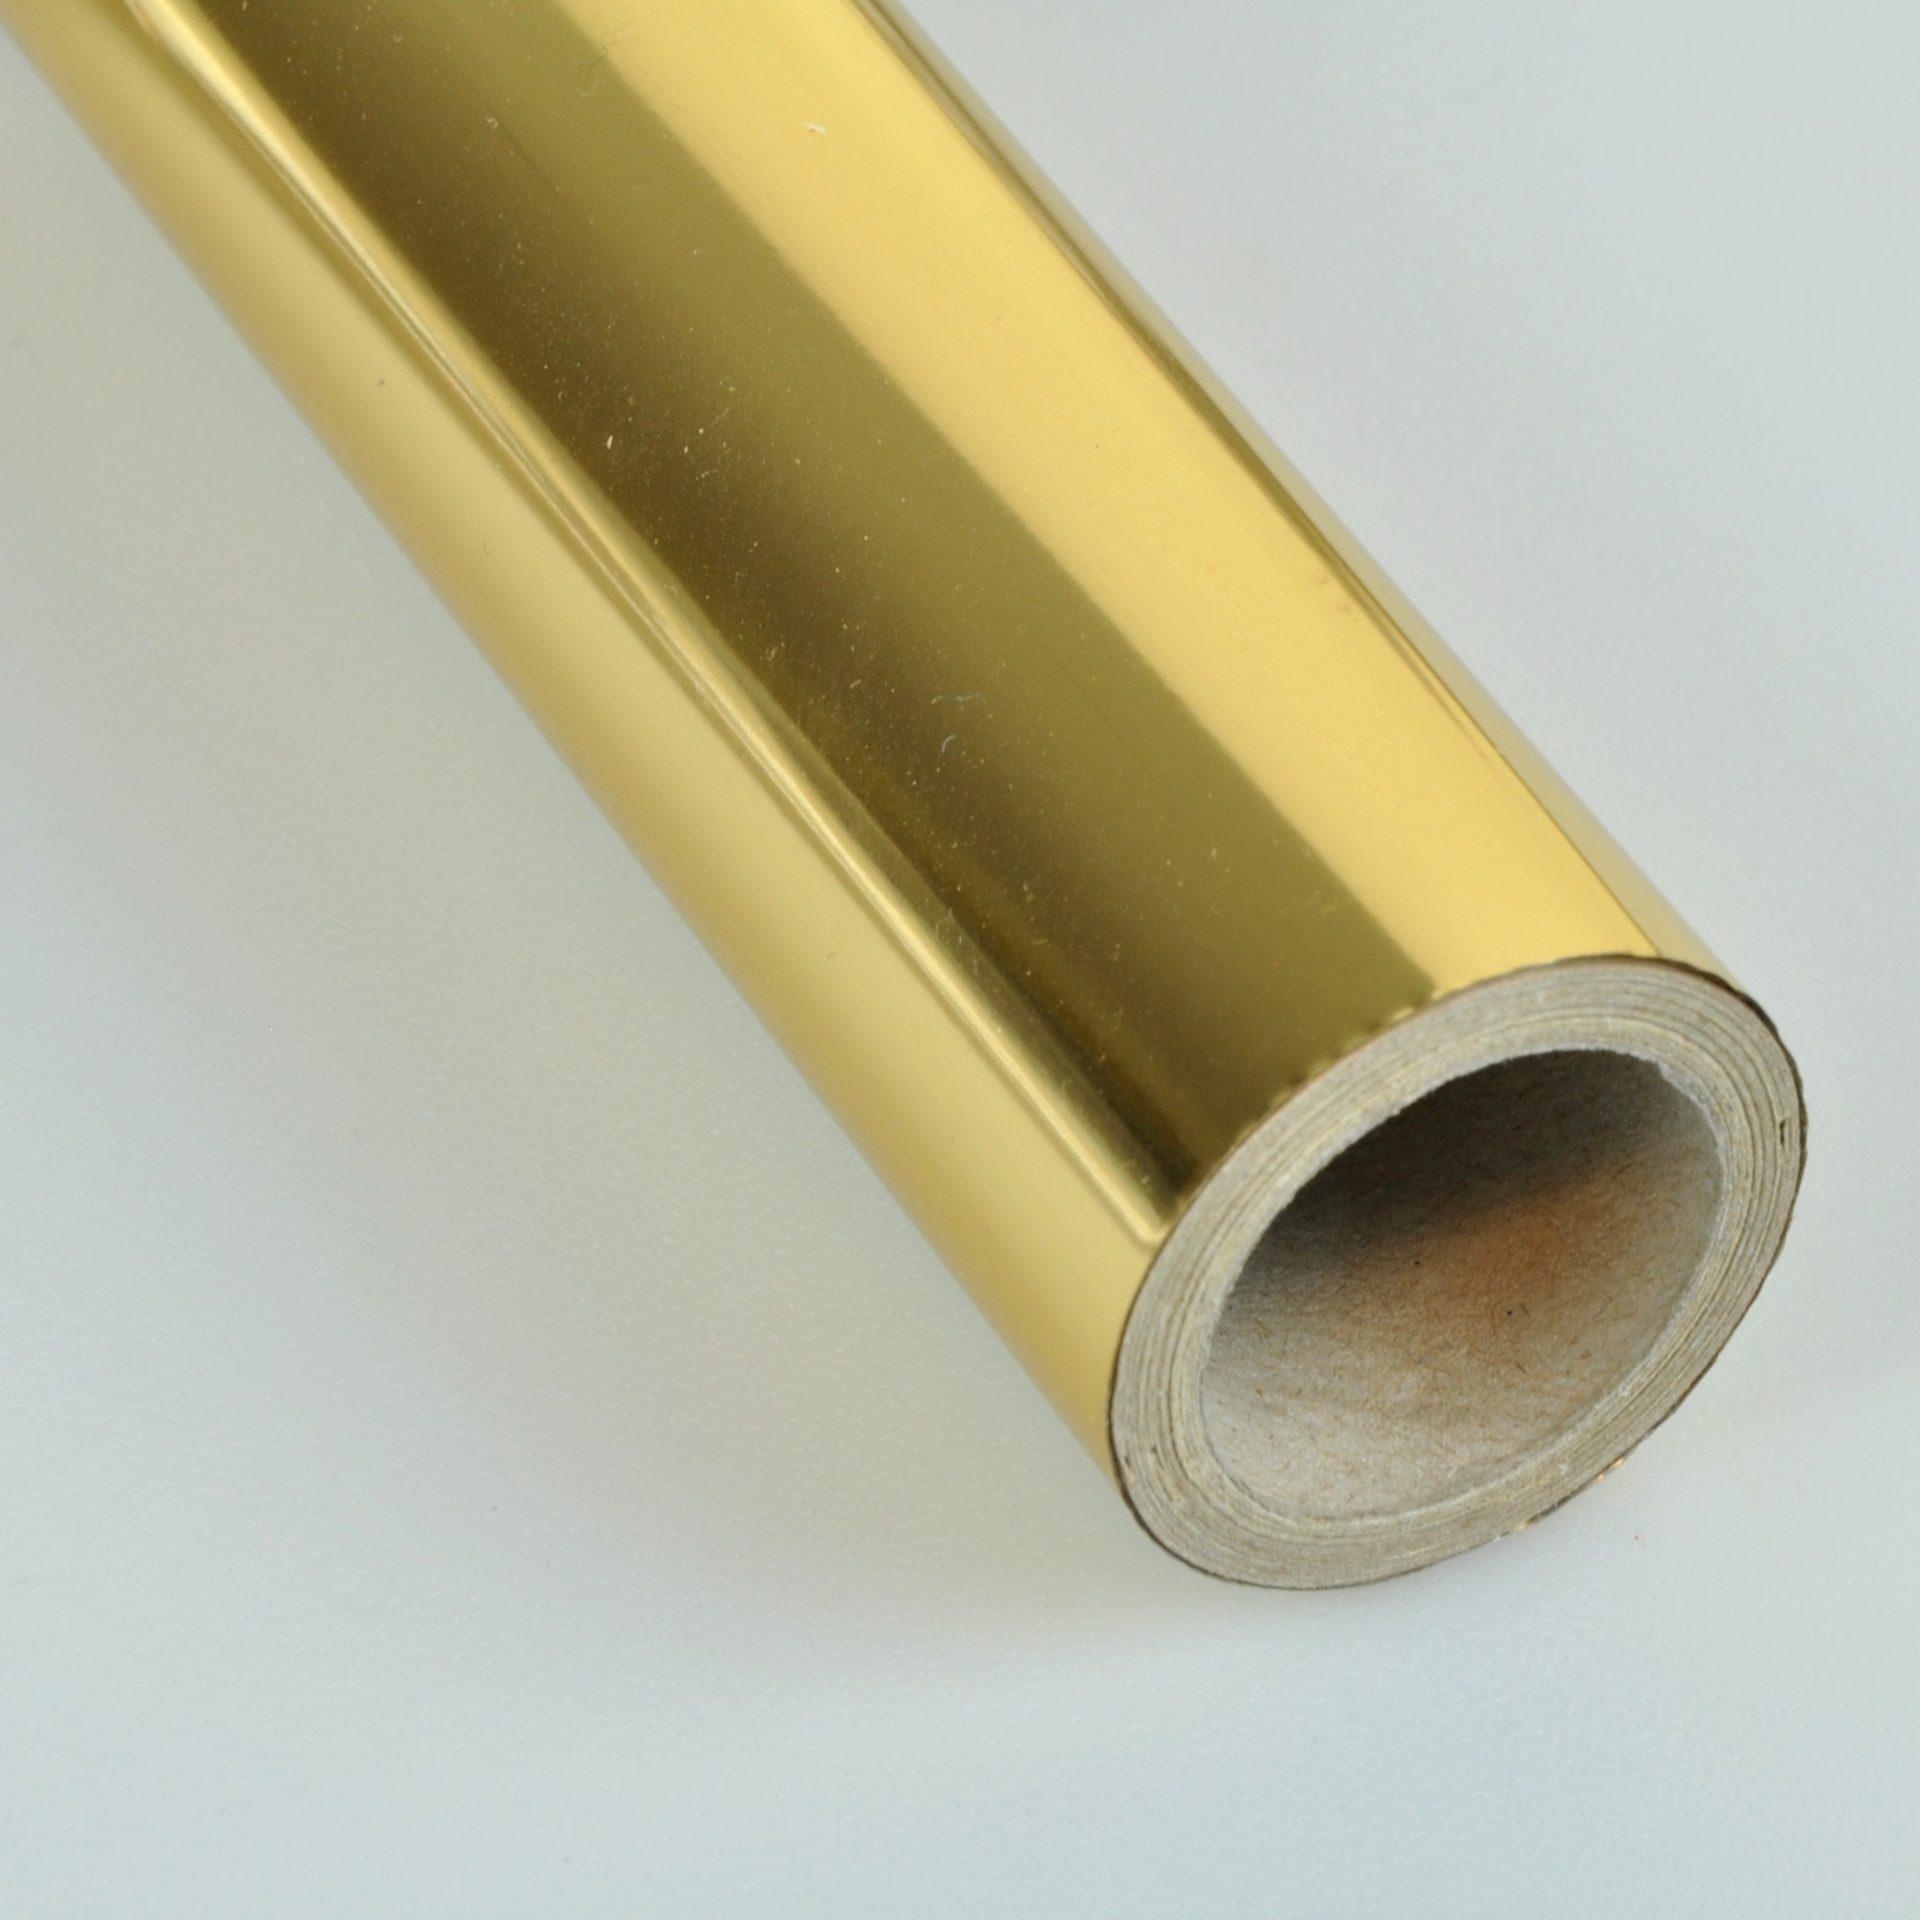 Gold T-Foil Roll of 30cm x 25m